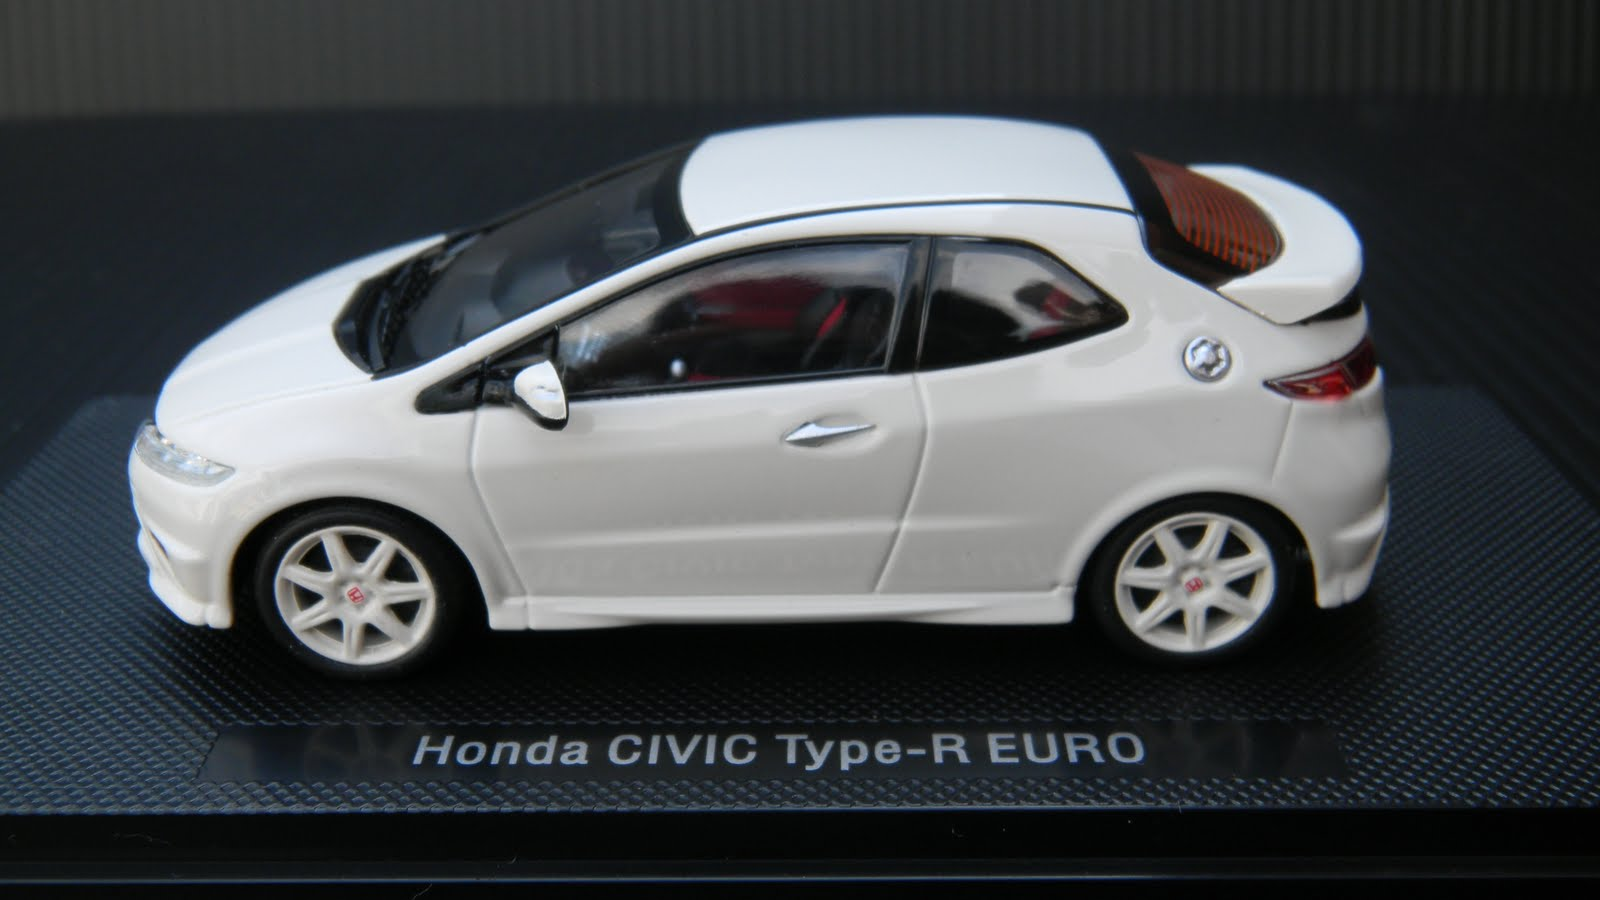 ebbro honda civic type-r euro (fn2)